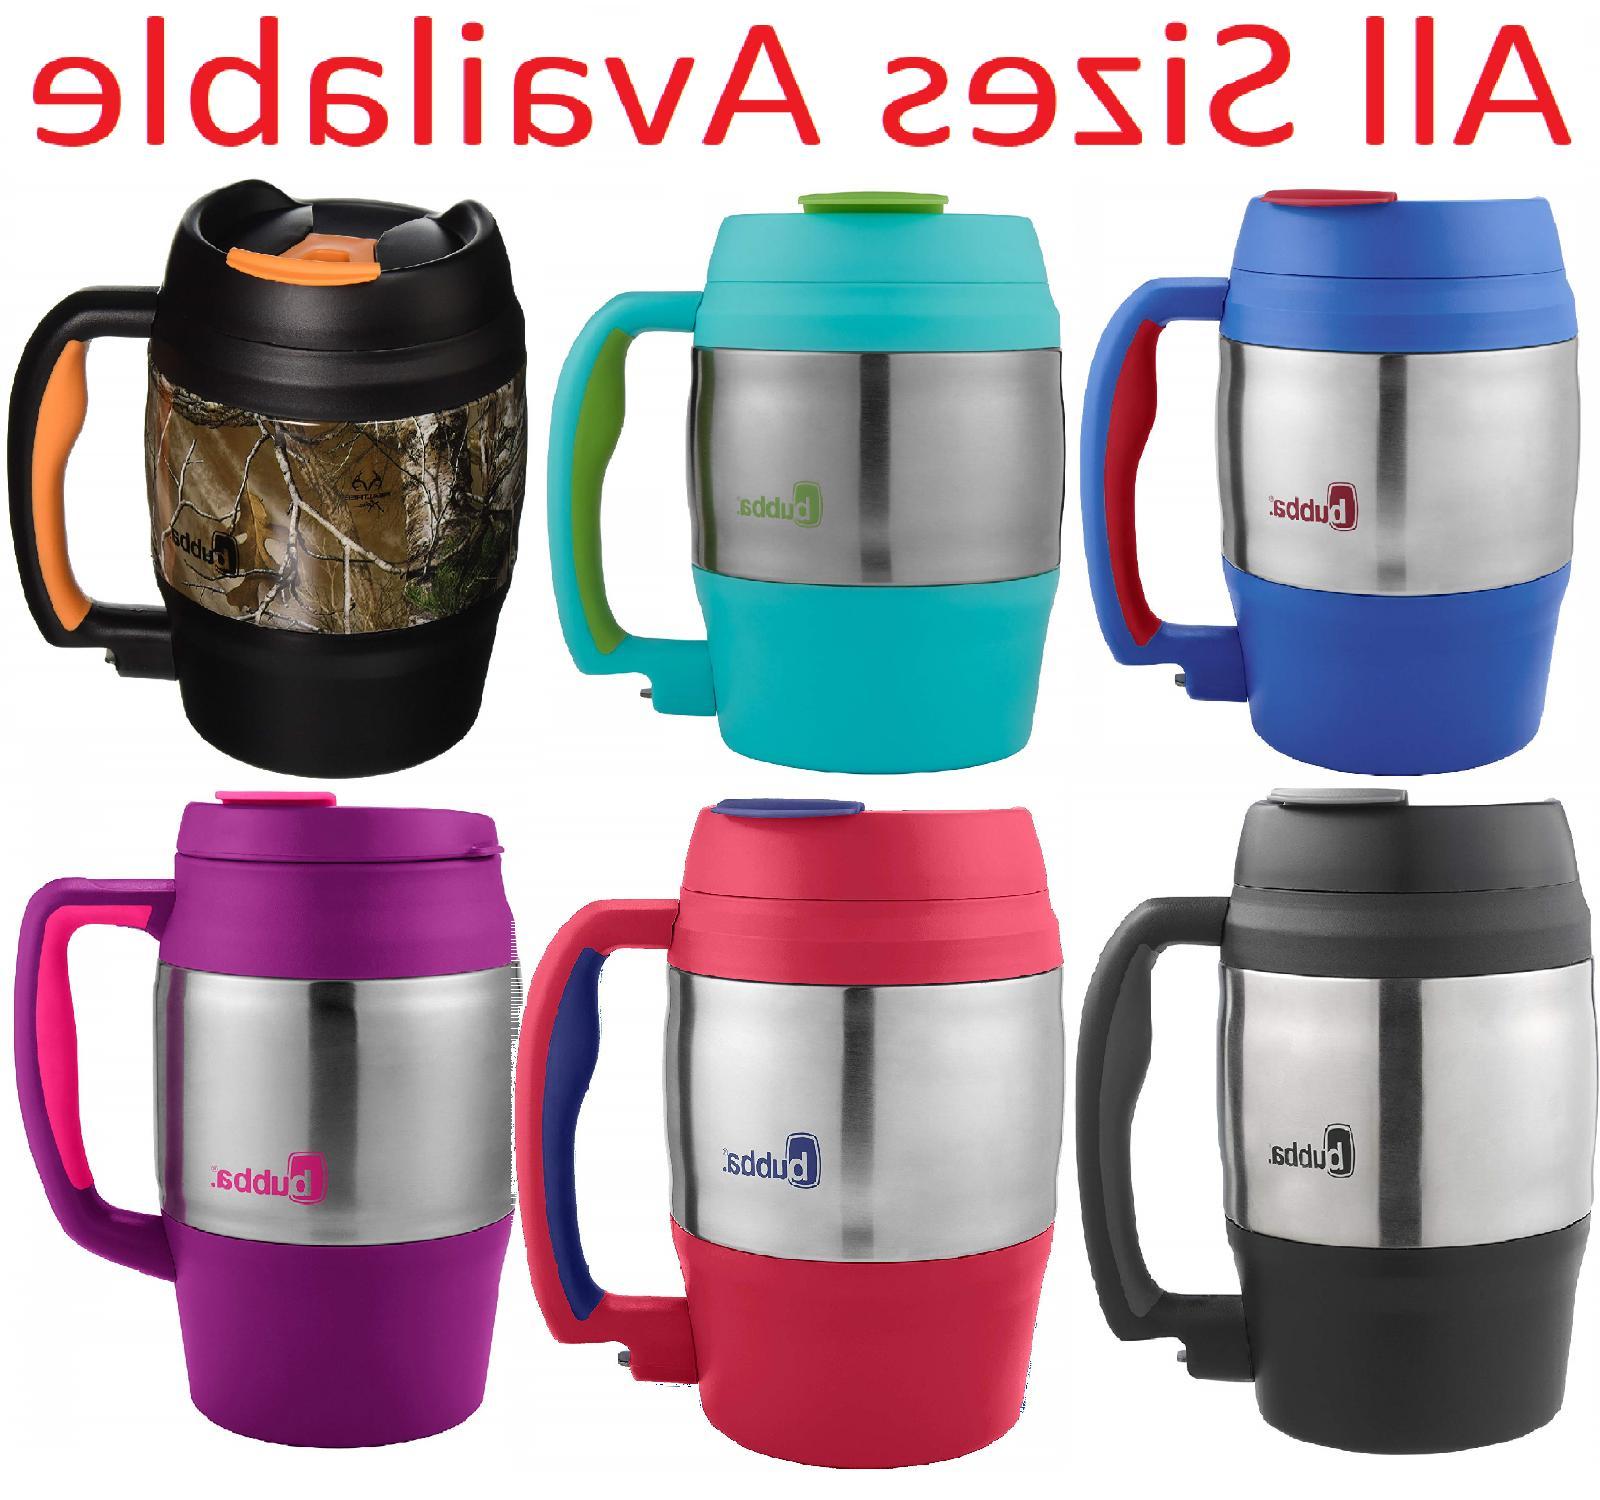 stainless steel insulated coffee mug handle lid